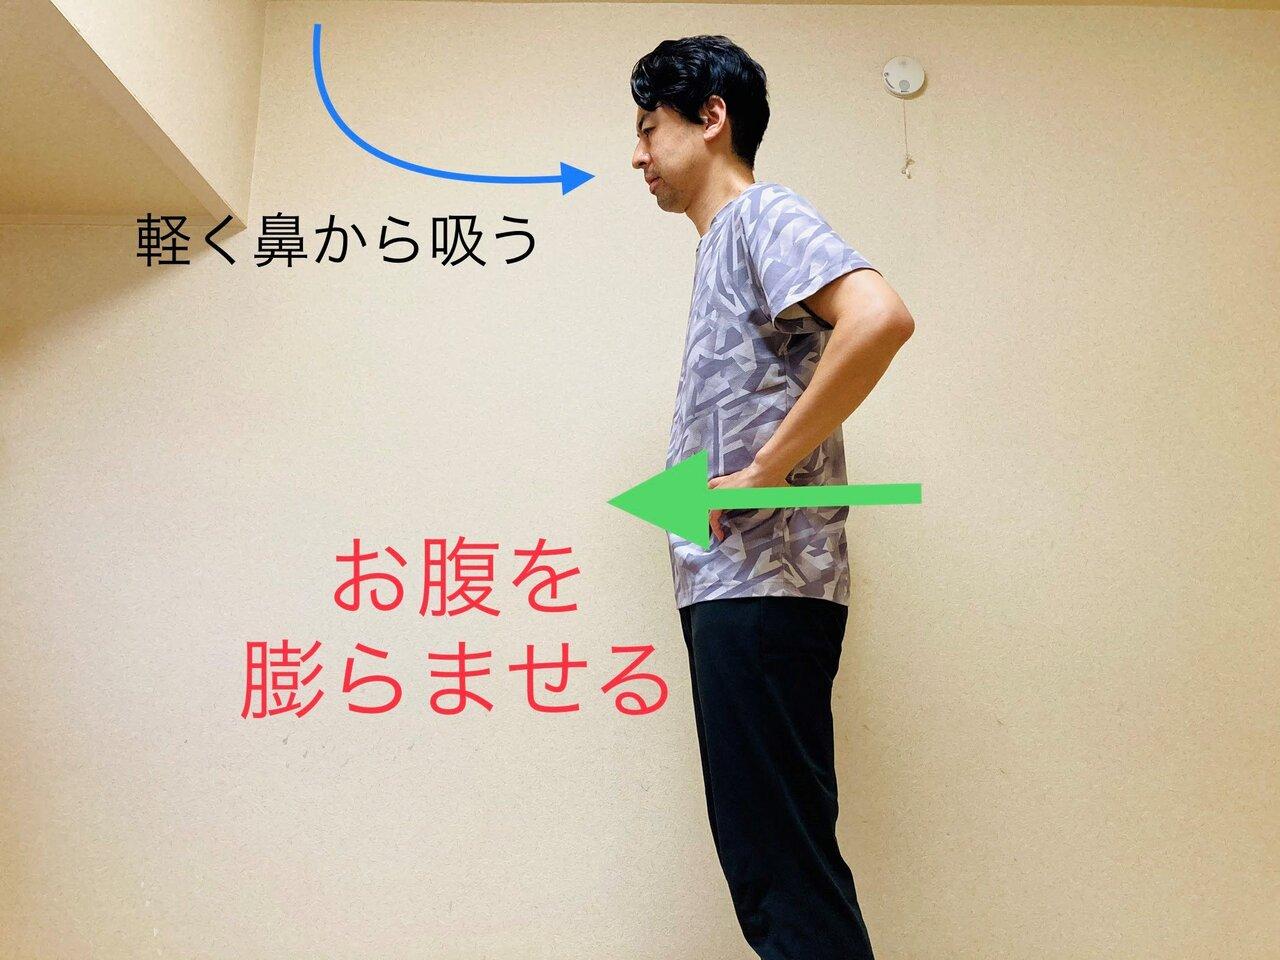 腹筋,片脚立ちエクササイズ